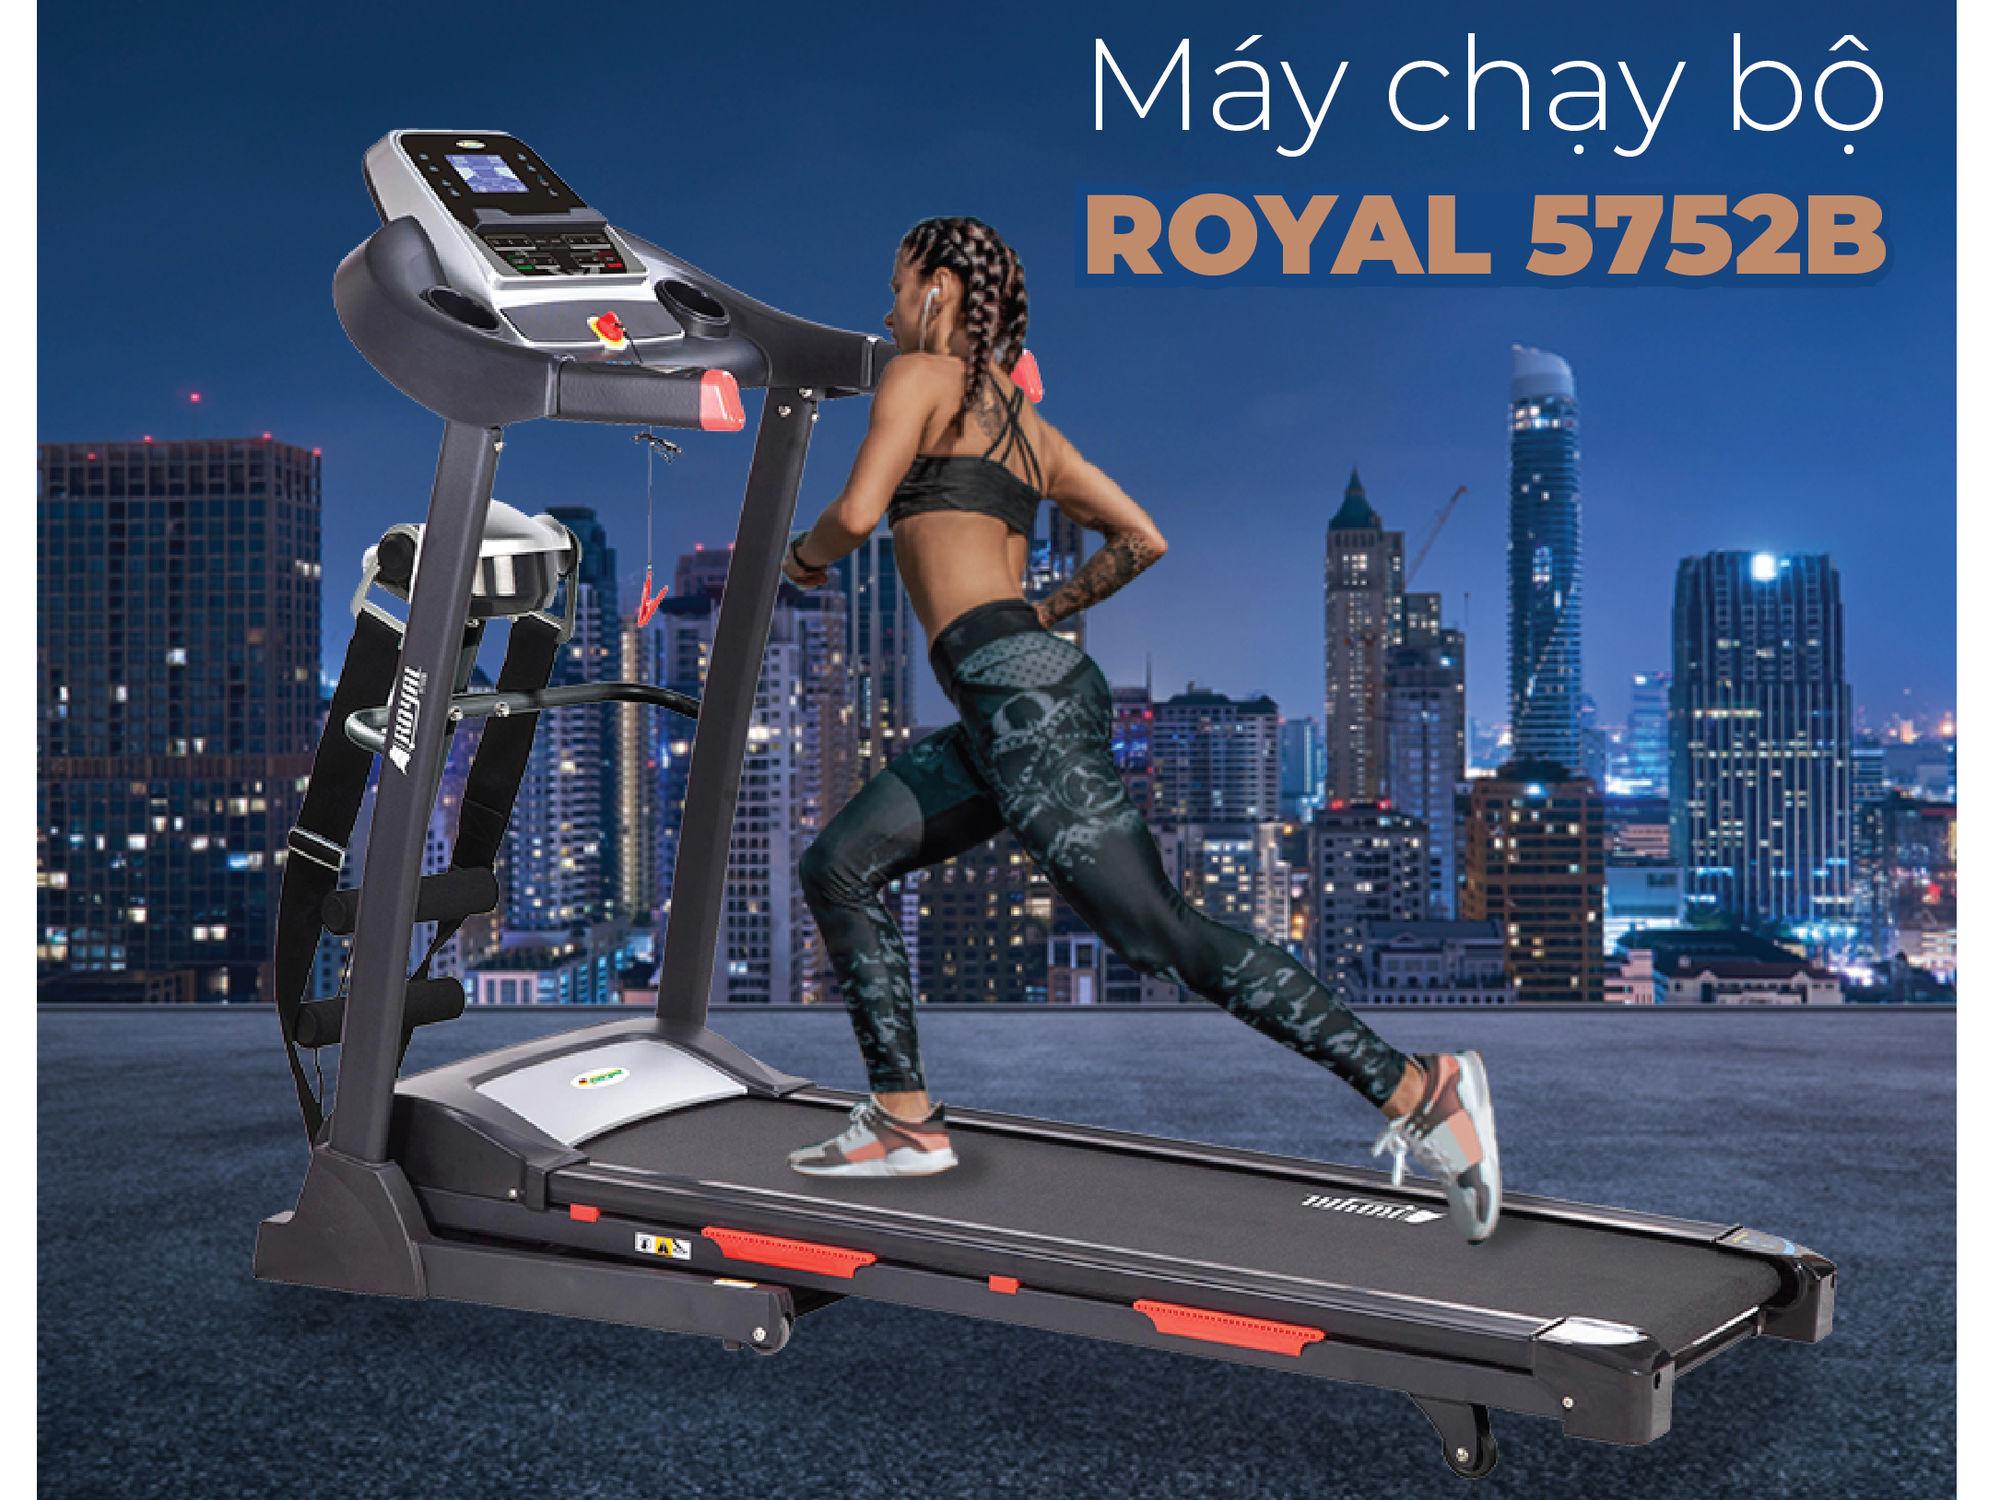 Royal 5752B